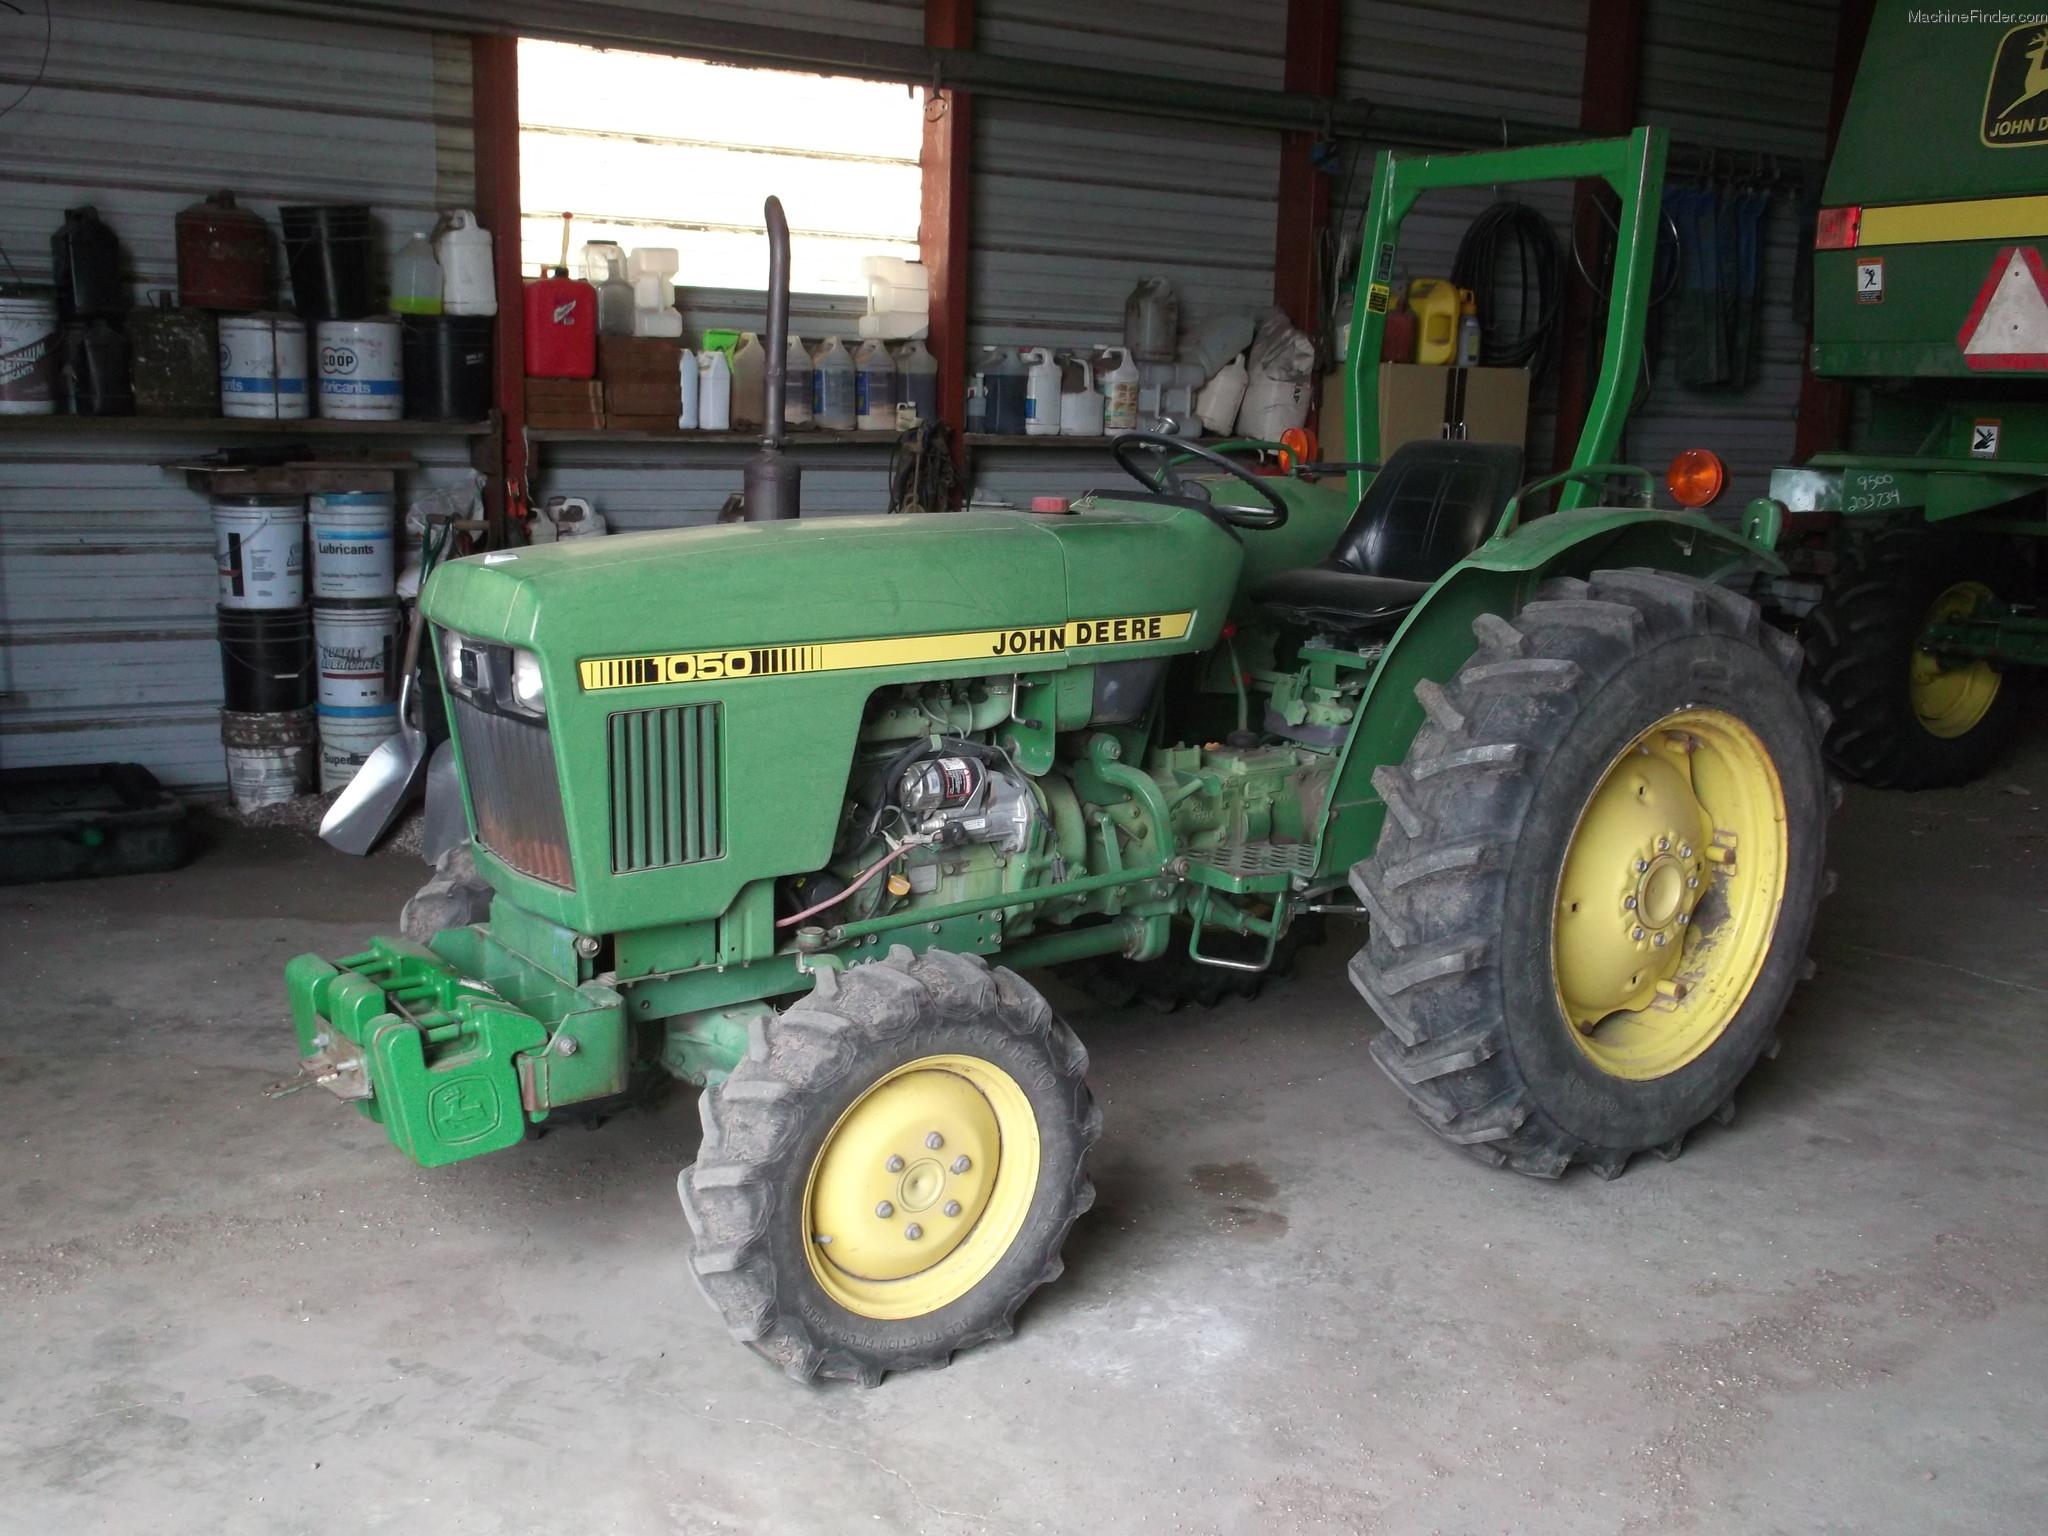 1986 John Deere 1050 Tractors - Compact (1-40hp.) - John ...